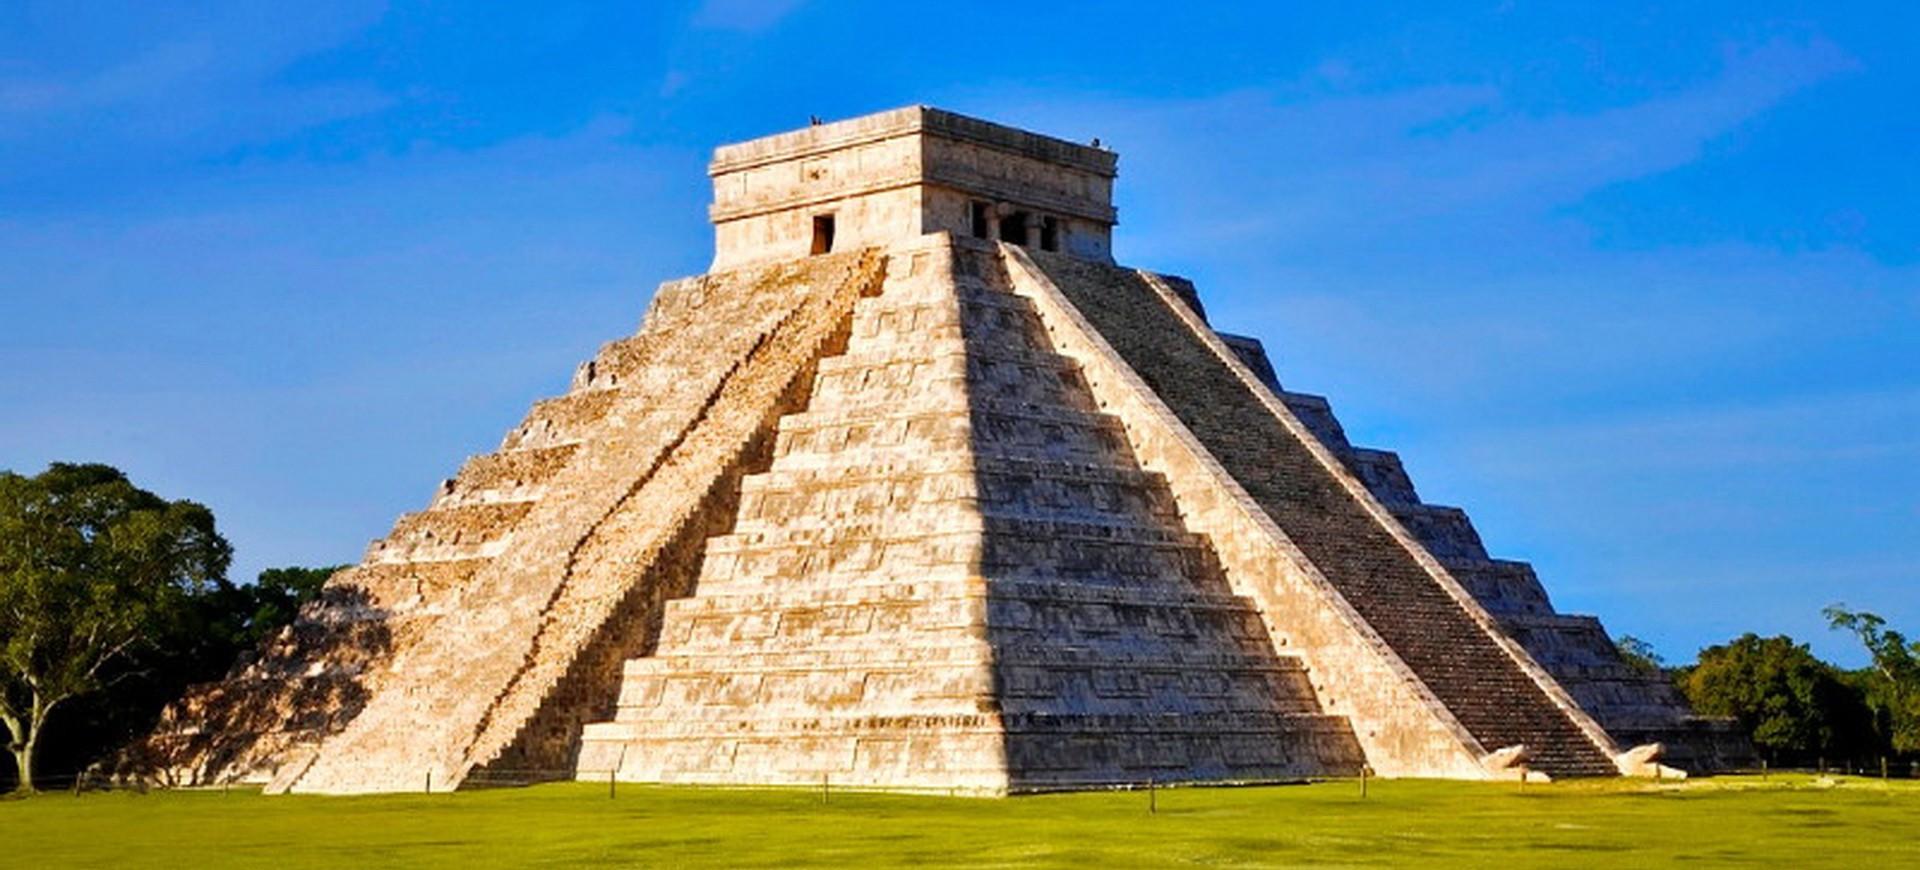 Pyramide à Chichen Itza